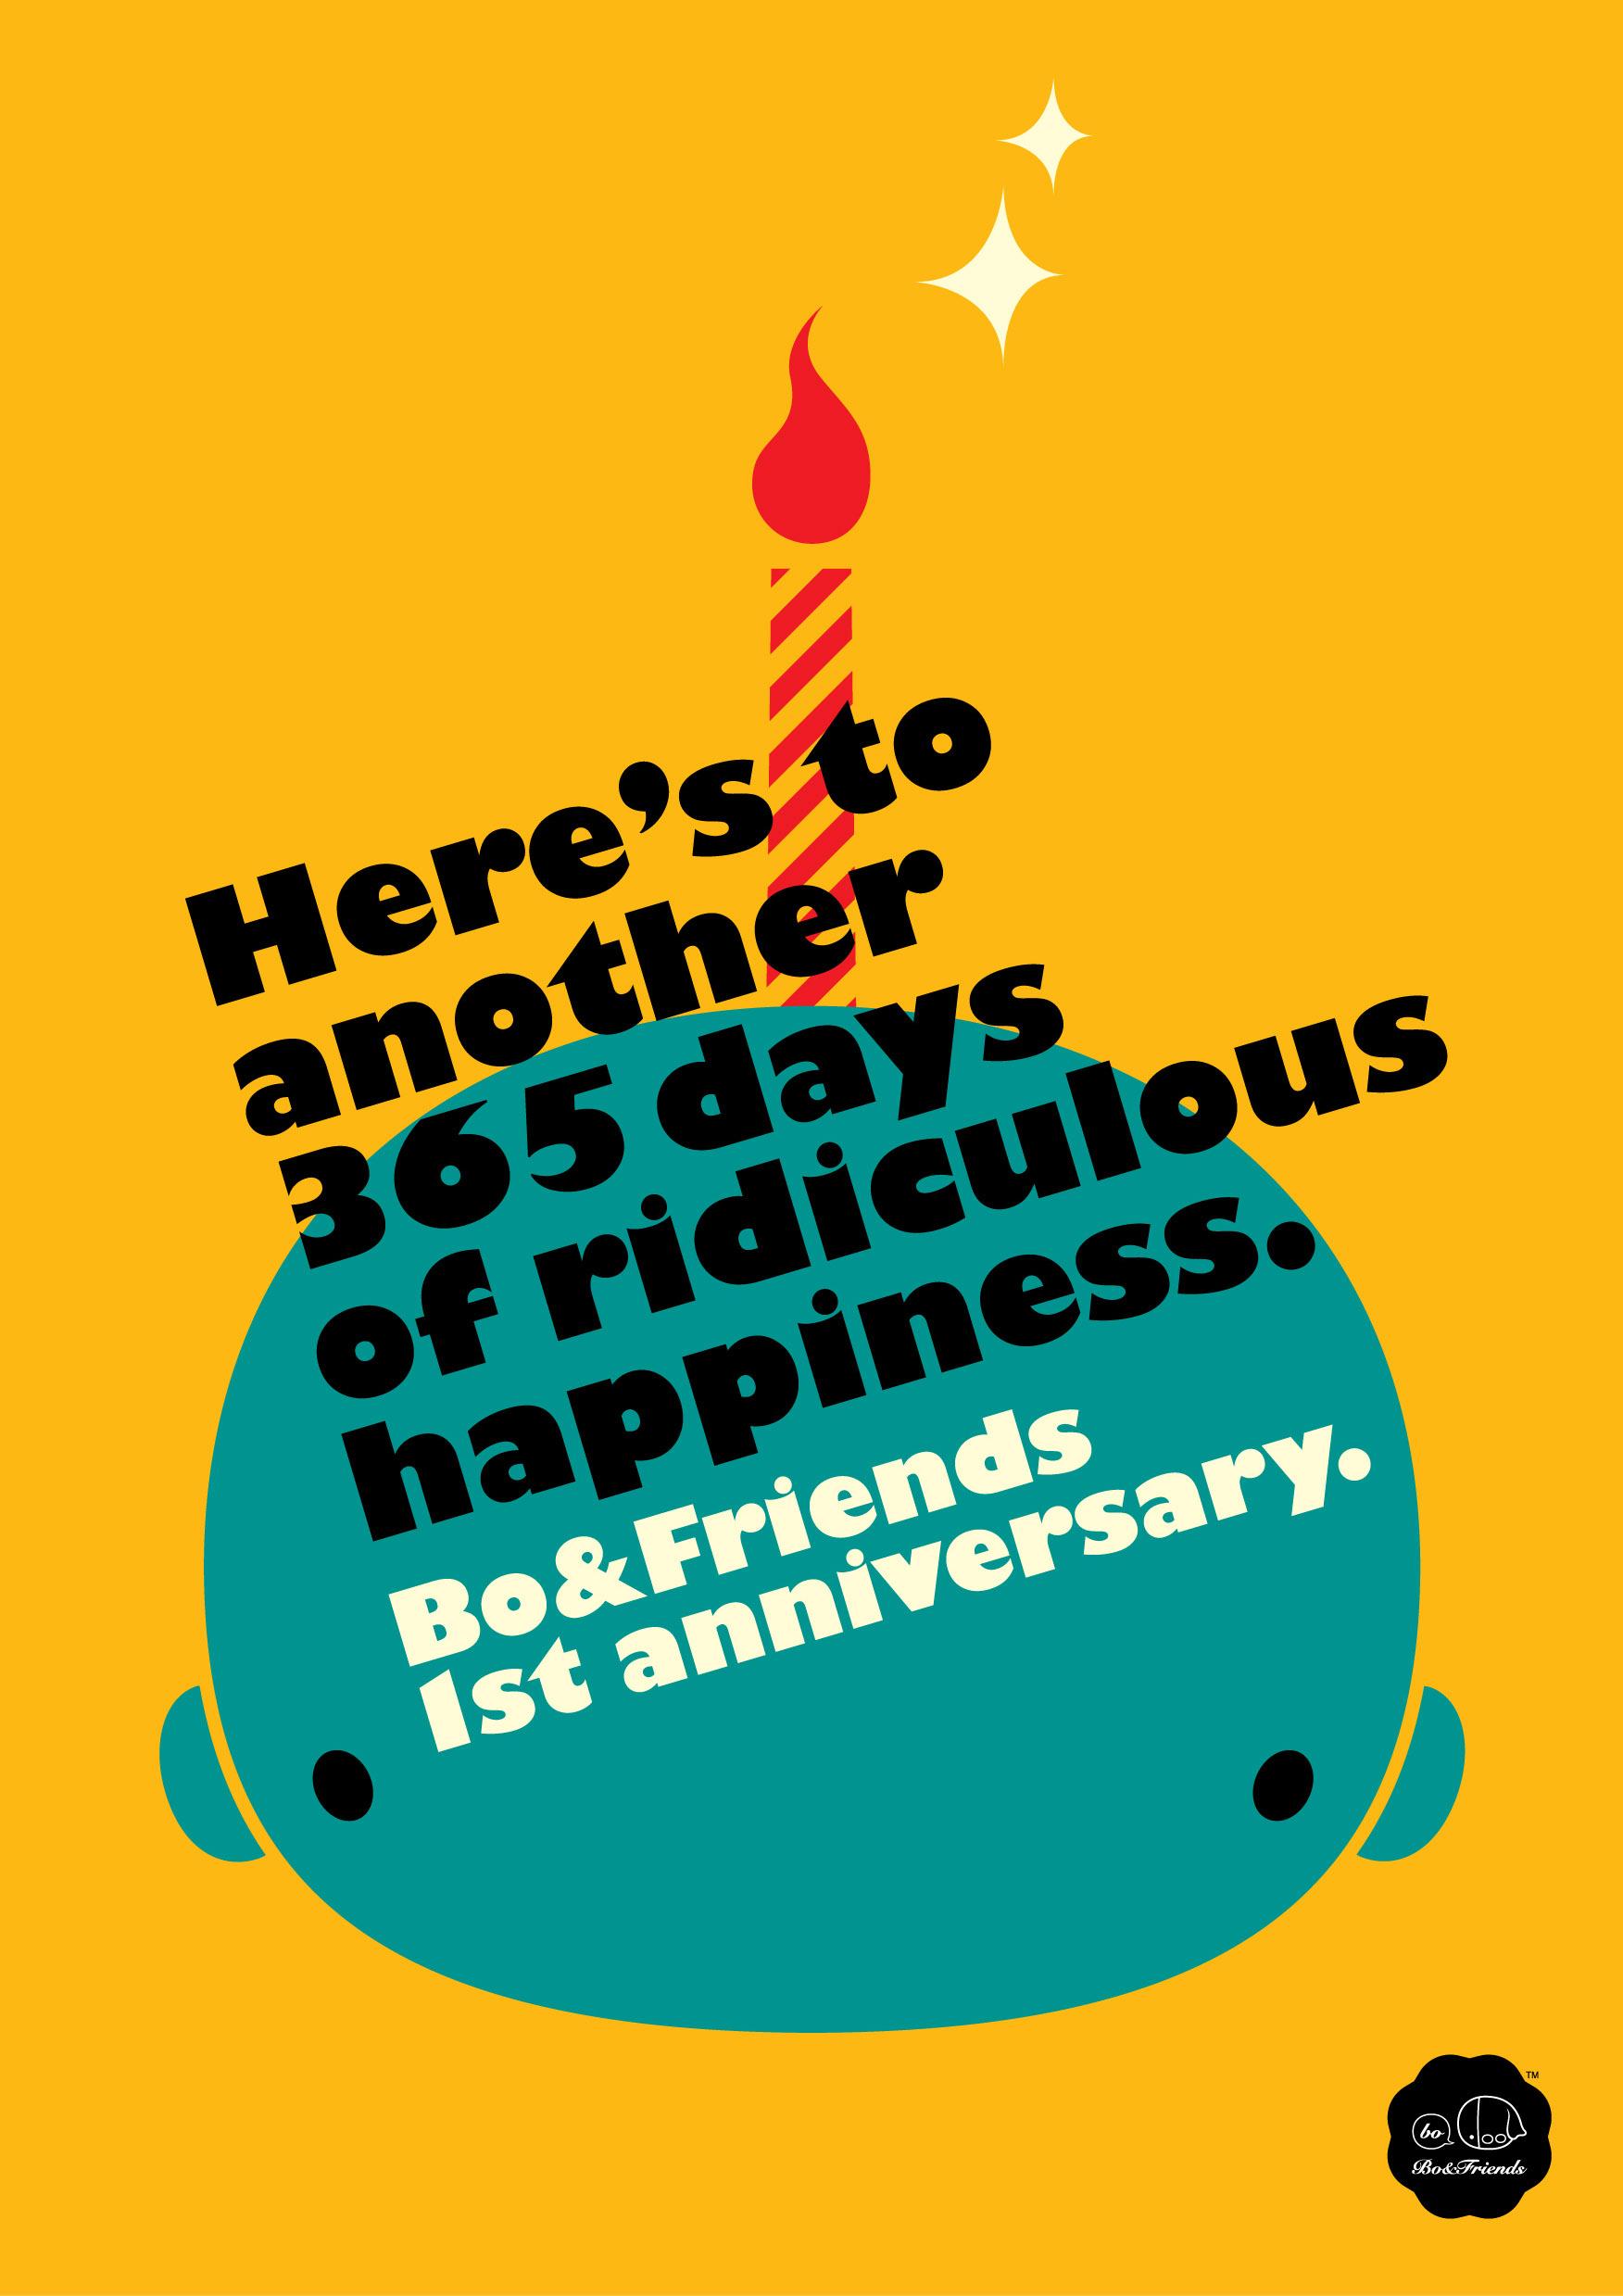 Happy 1st Anniversary Bofriends Bofriends